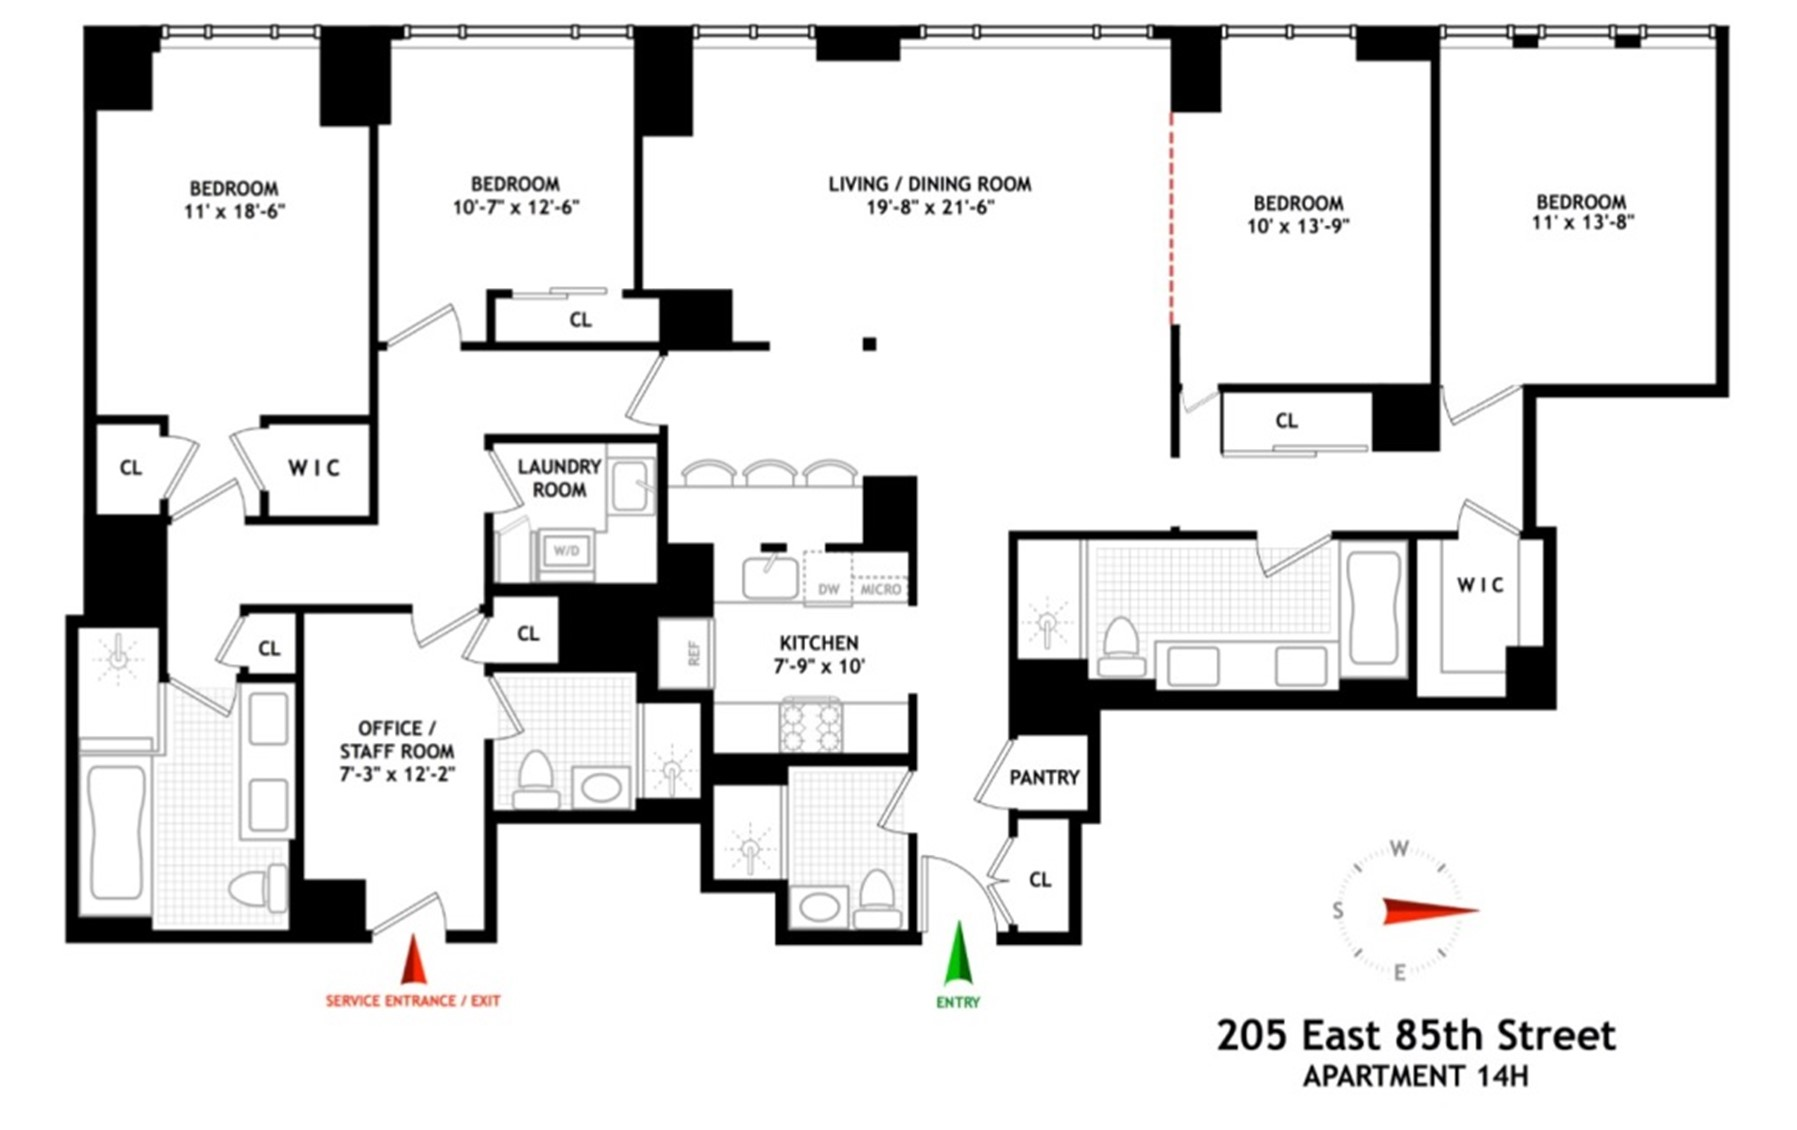 205 East 85th Street Upper East Side New York NY 10028